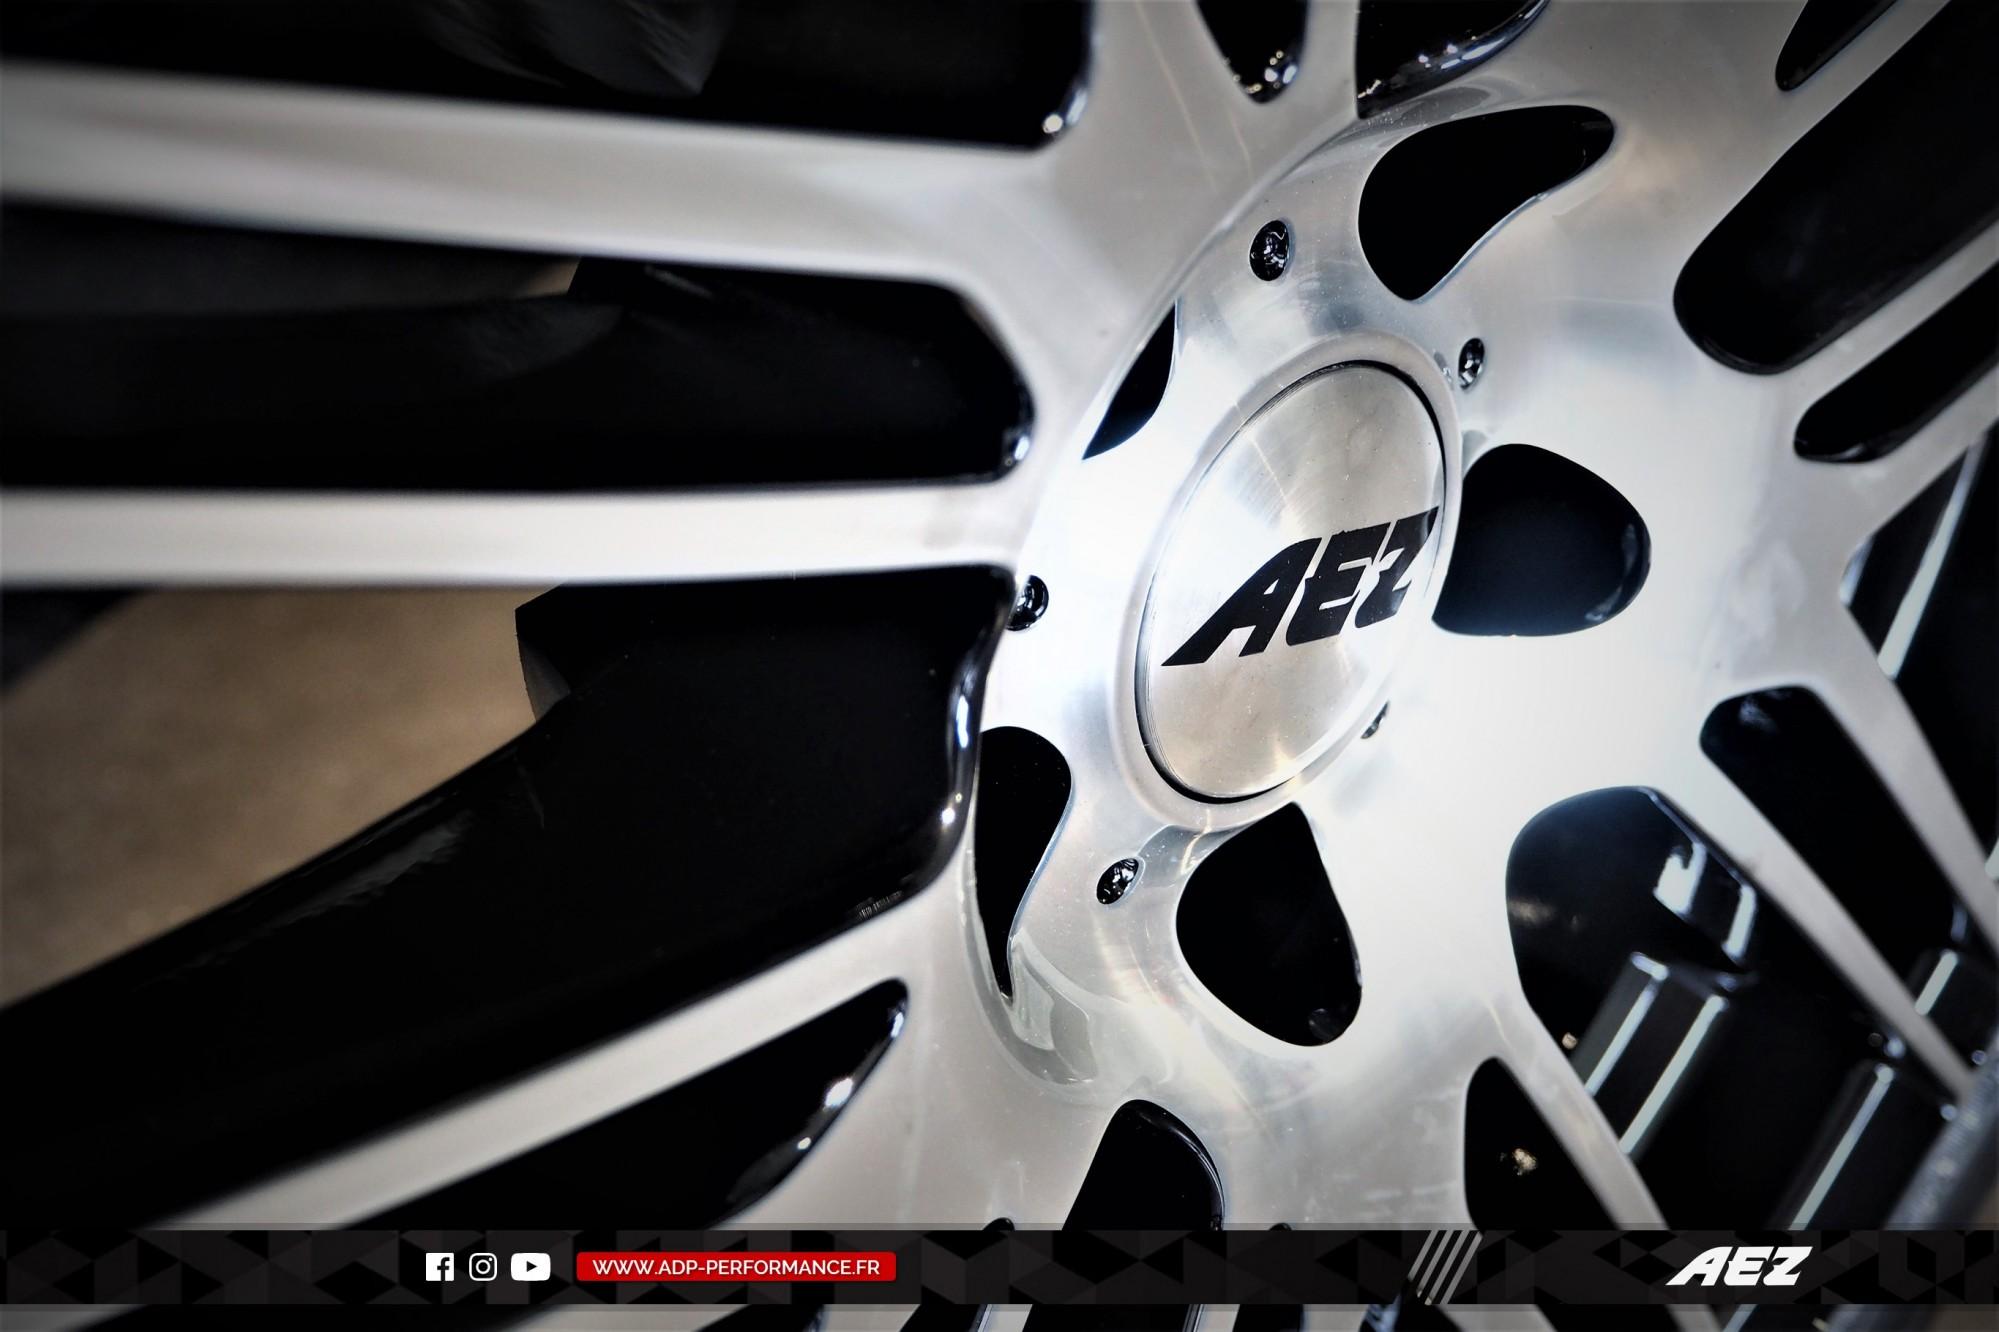 Jantes AEZ Aix en Provence - Land Rover Evoque - ADP Performance